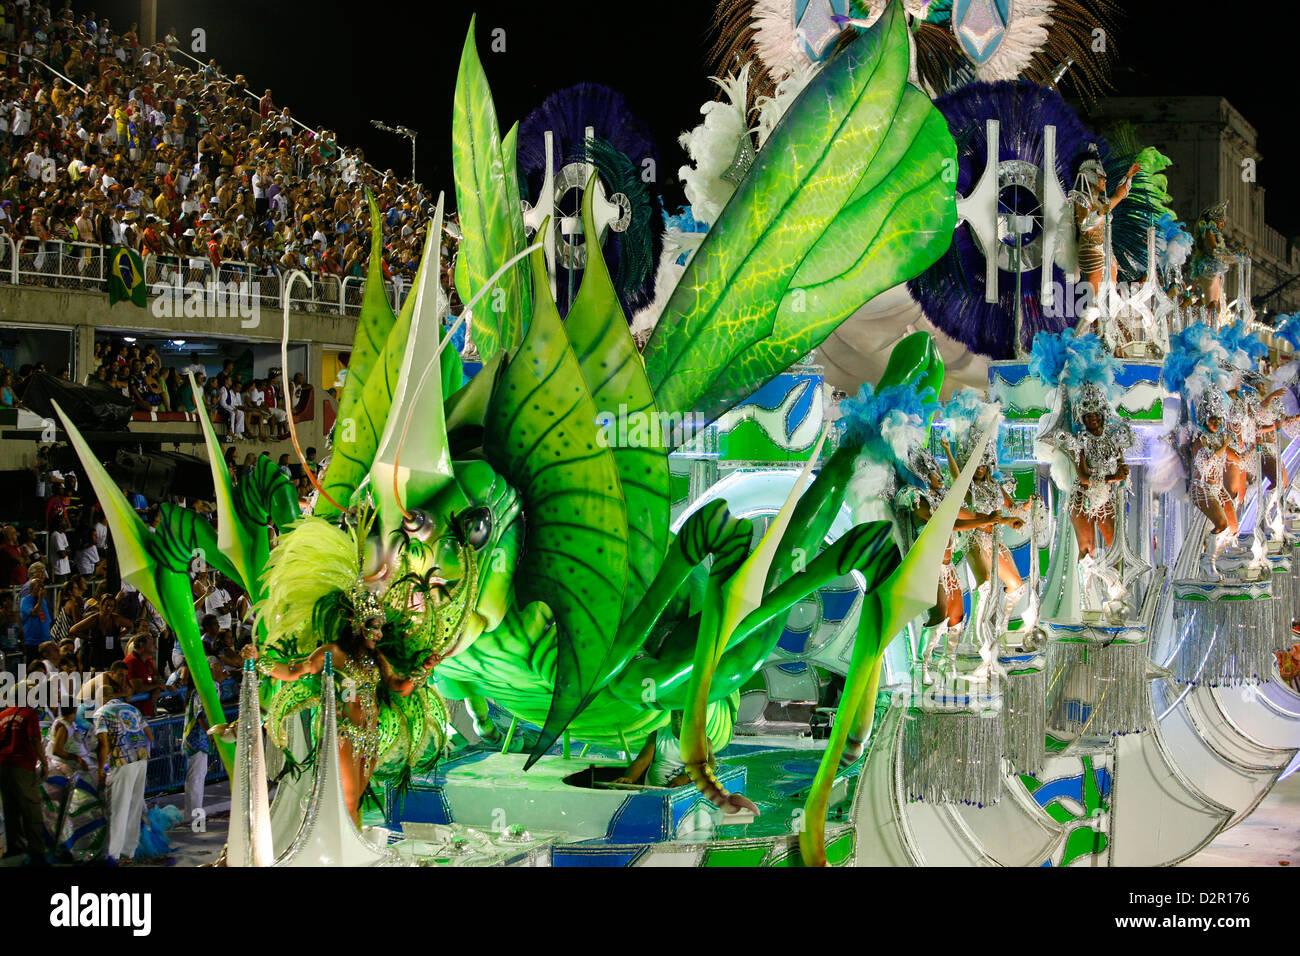 Desfile de Carnaval en el Sambódromo de Rio de Janeiro, Brasil, América del Sur Imagen De Stock